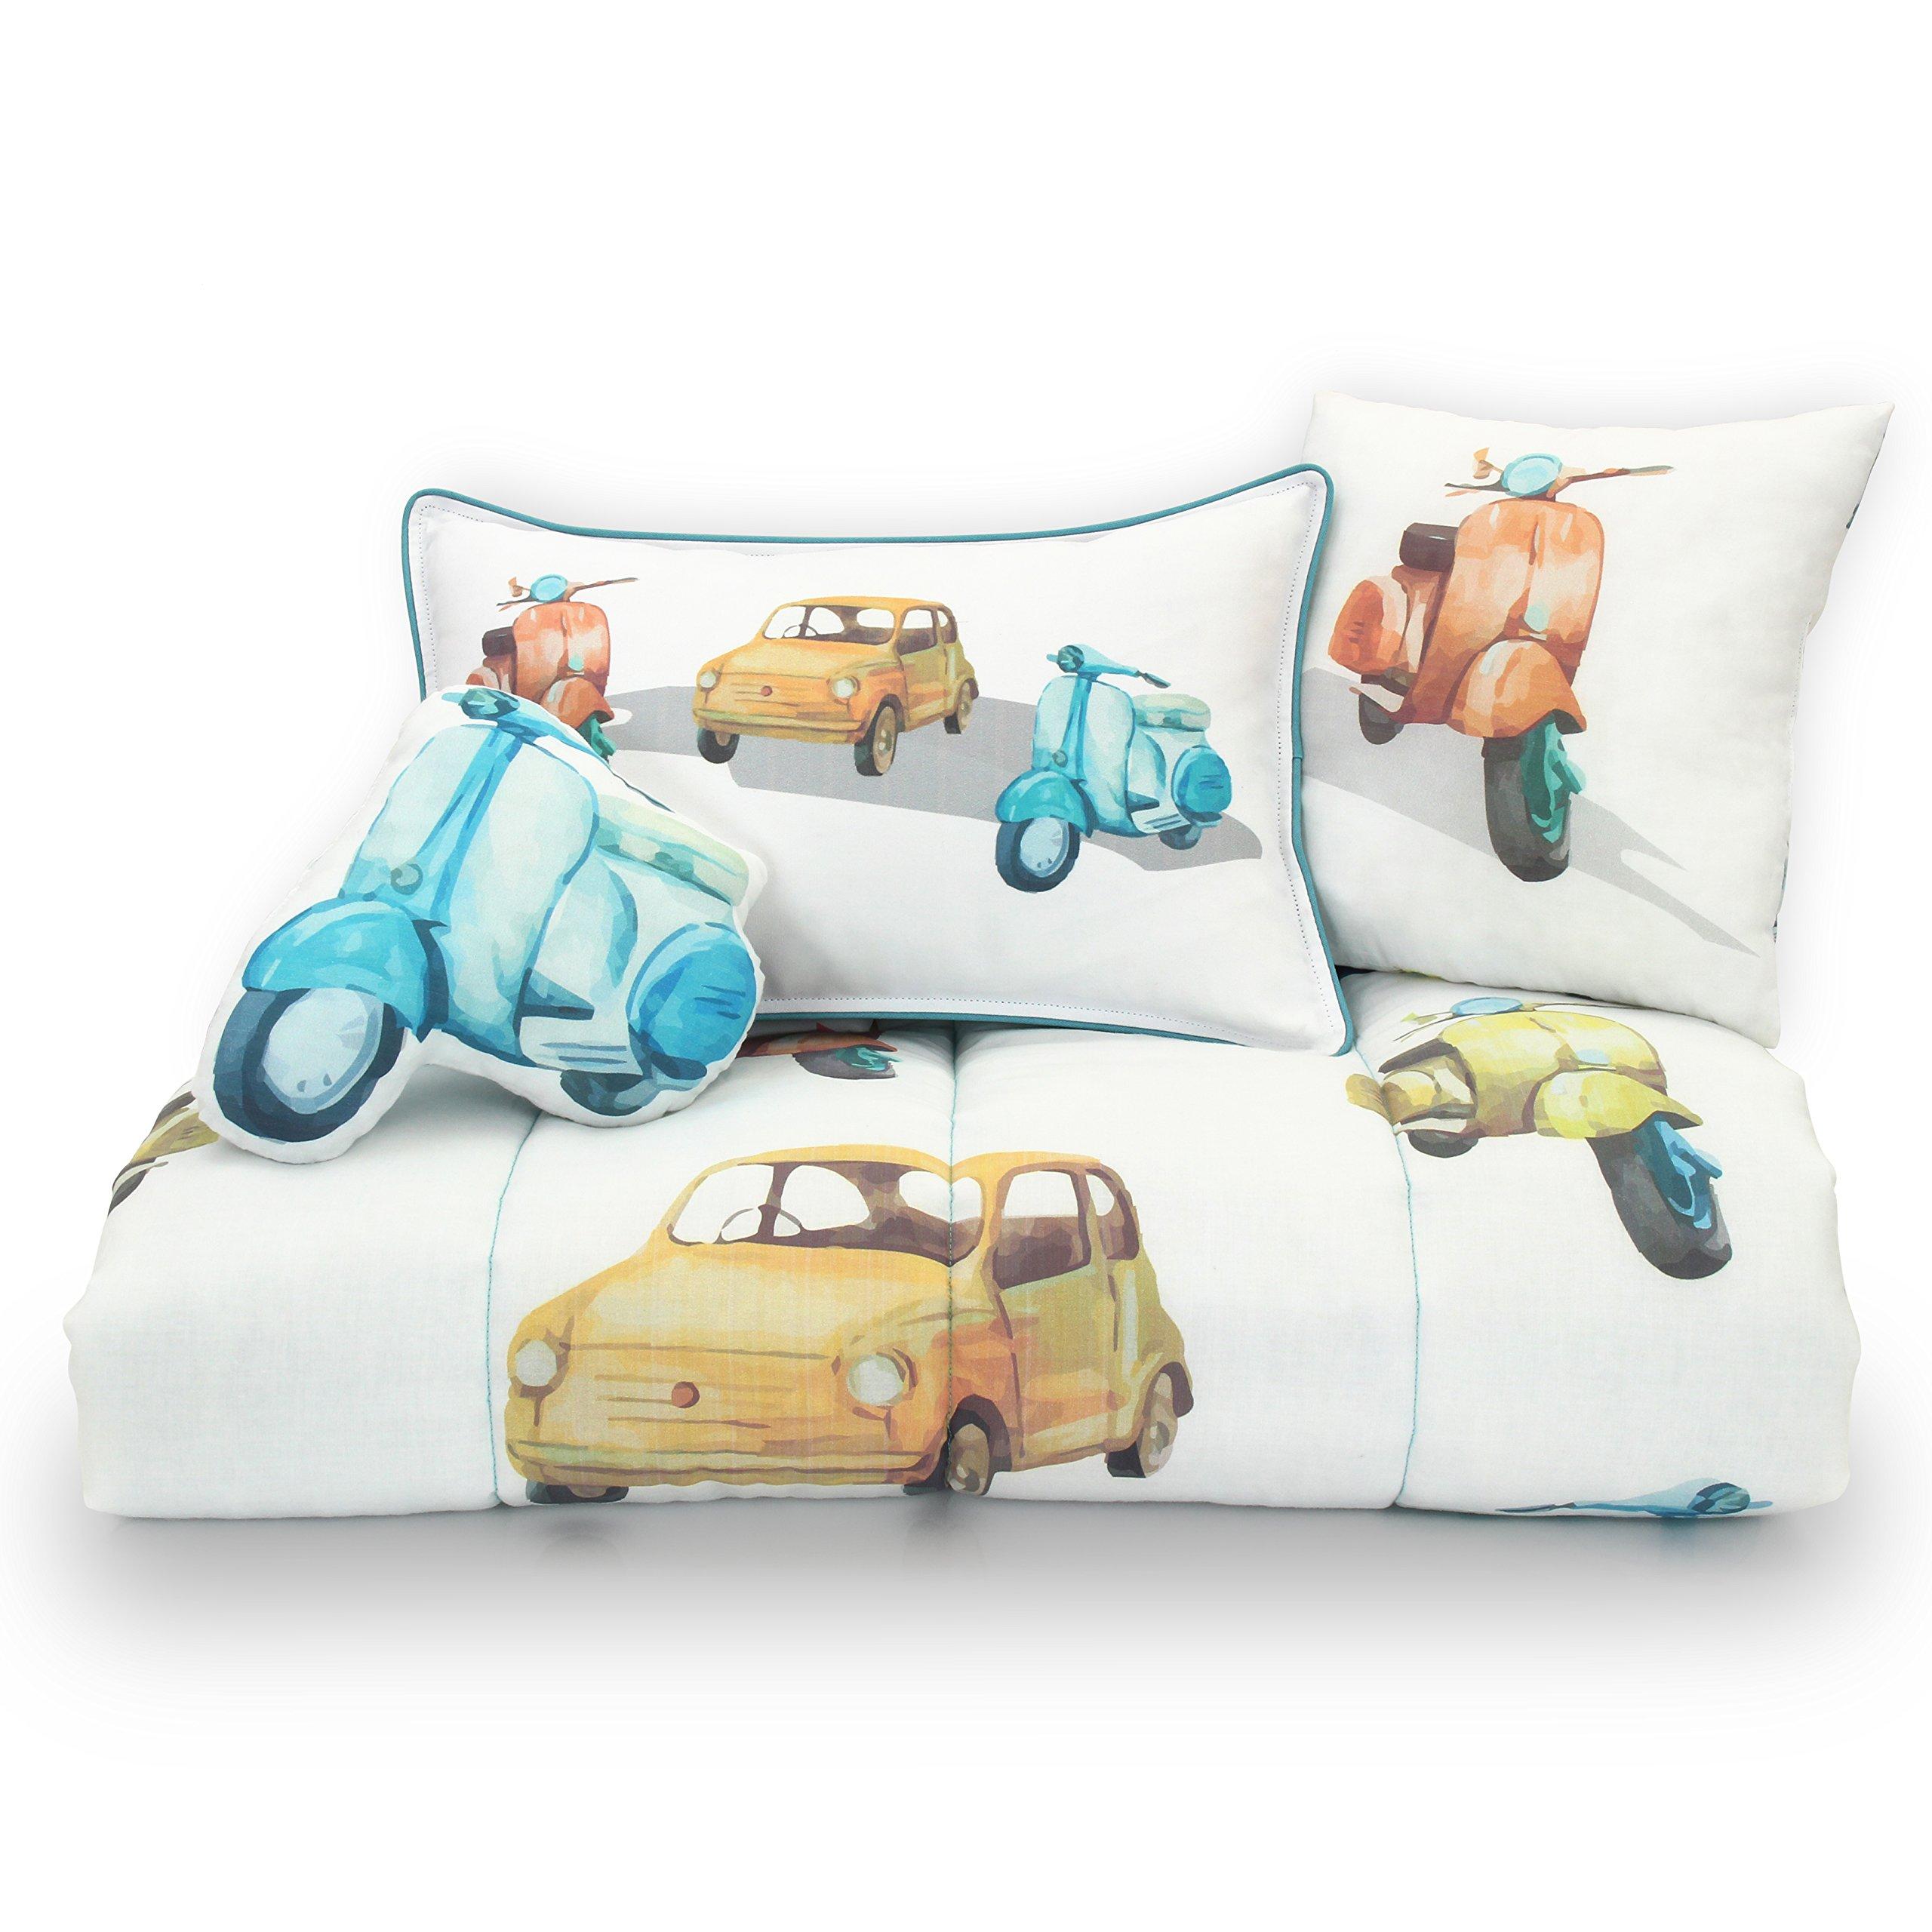 Lincove 4 Piece Toddler Crib Bedding Set - 100% Cotton Vintage Cars Toddler Crib Bed Set - Reversible Quilt 47'' x 39''